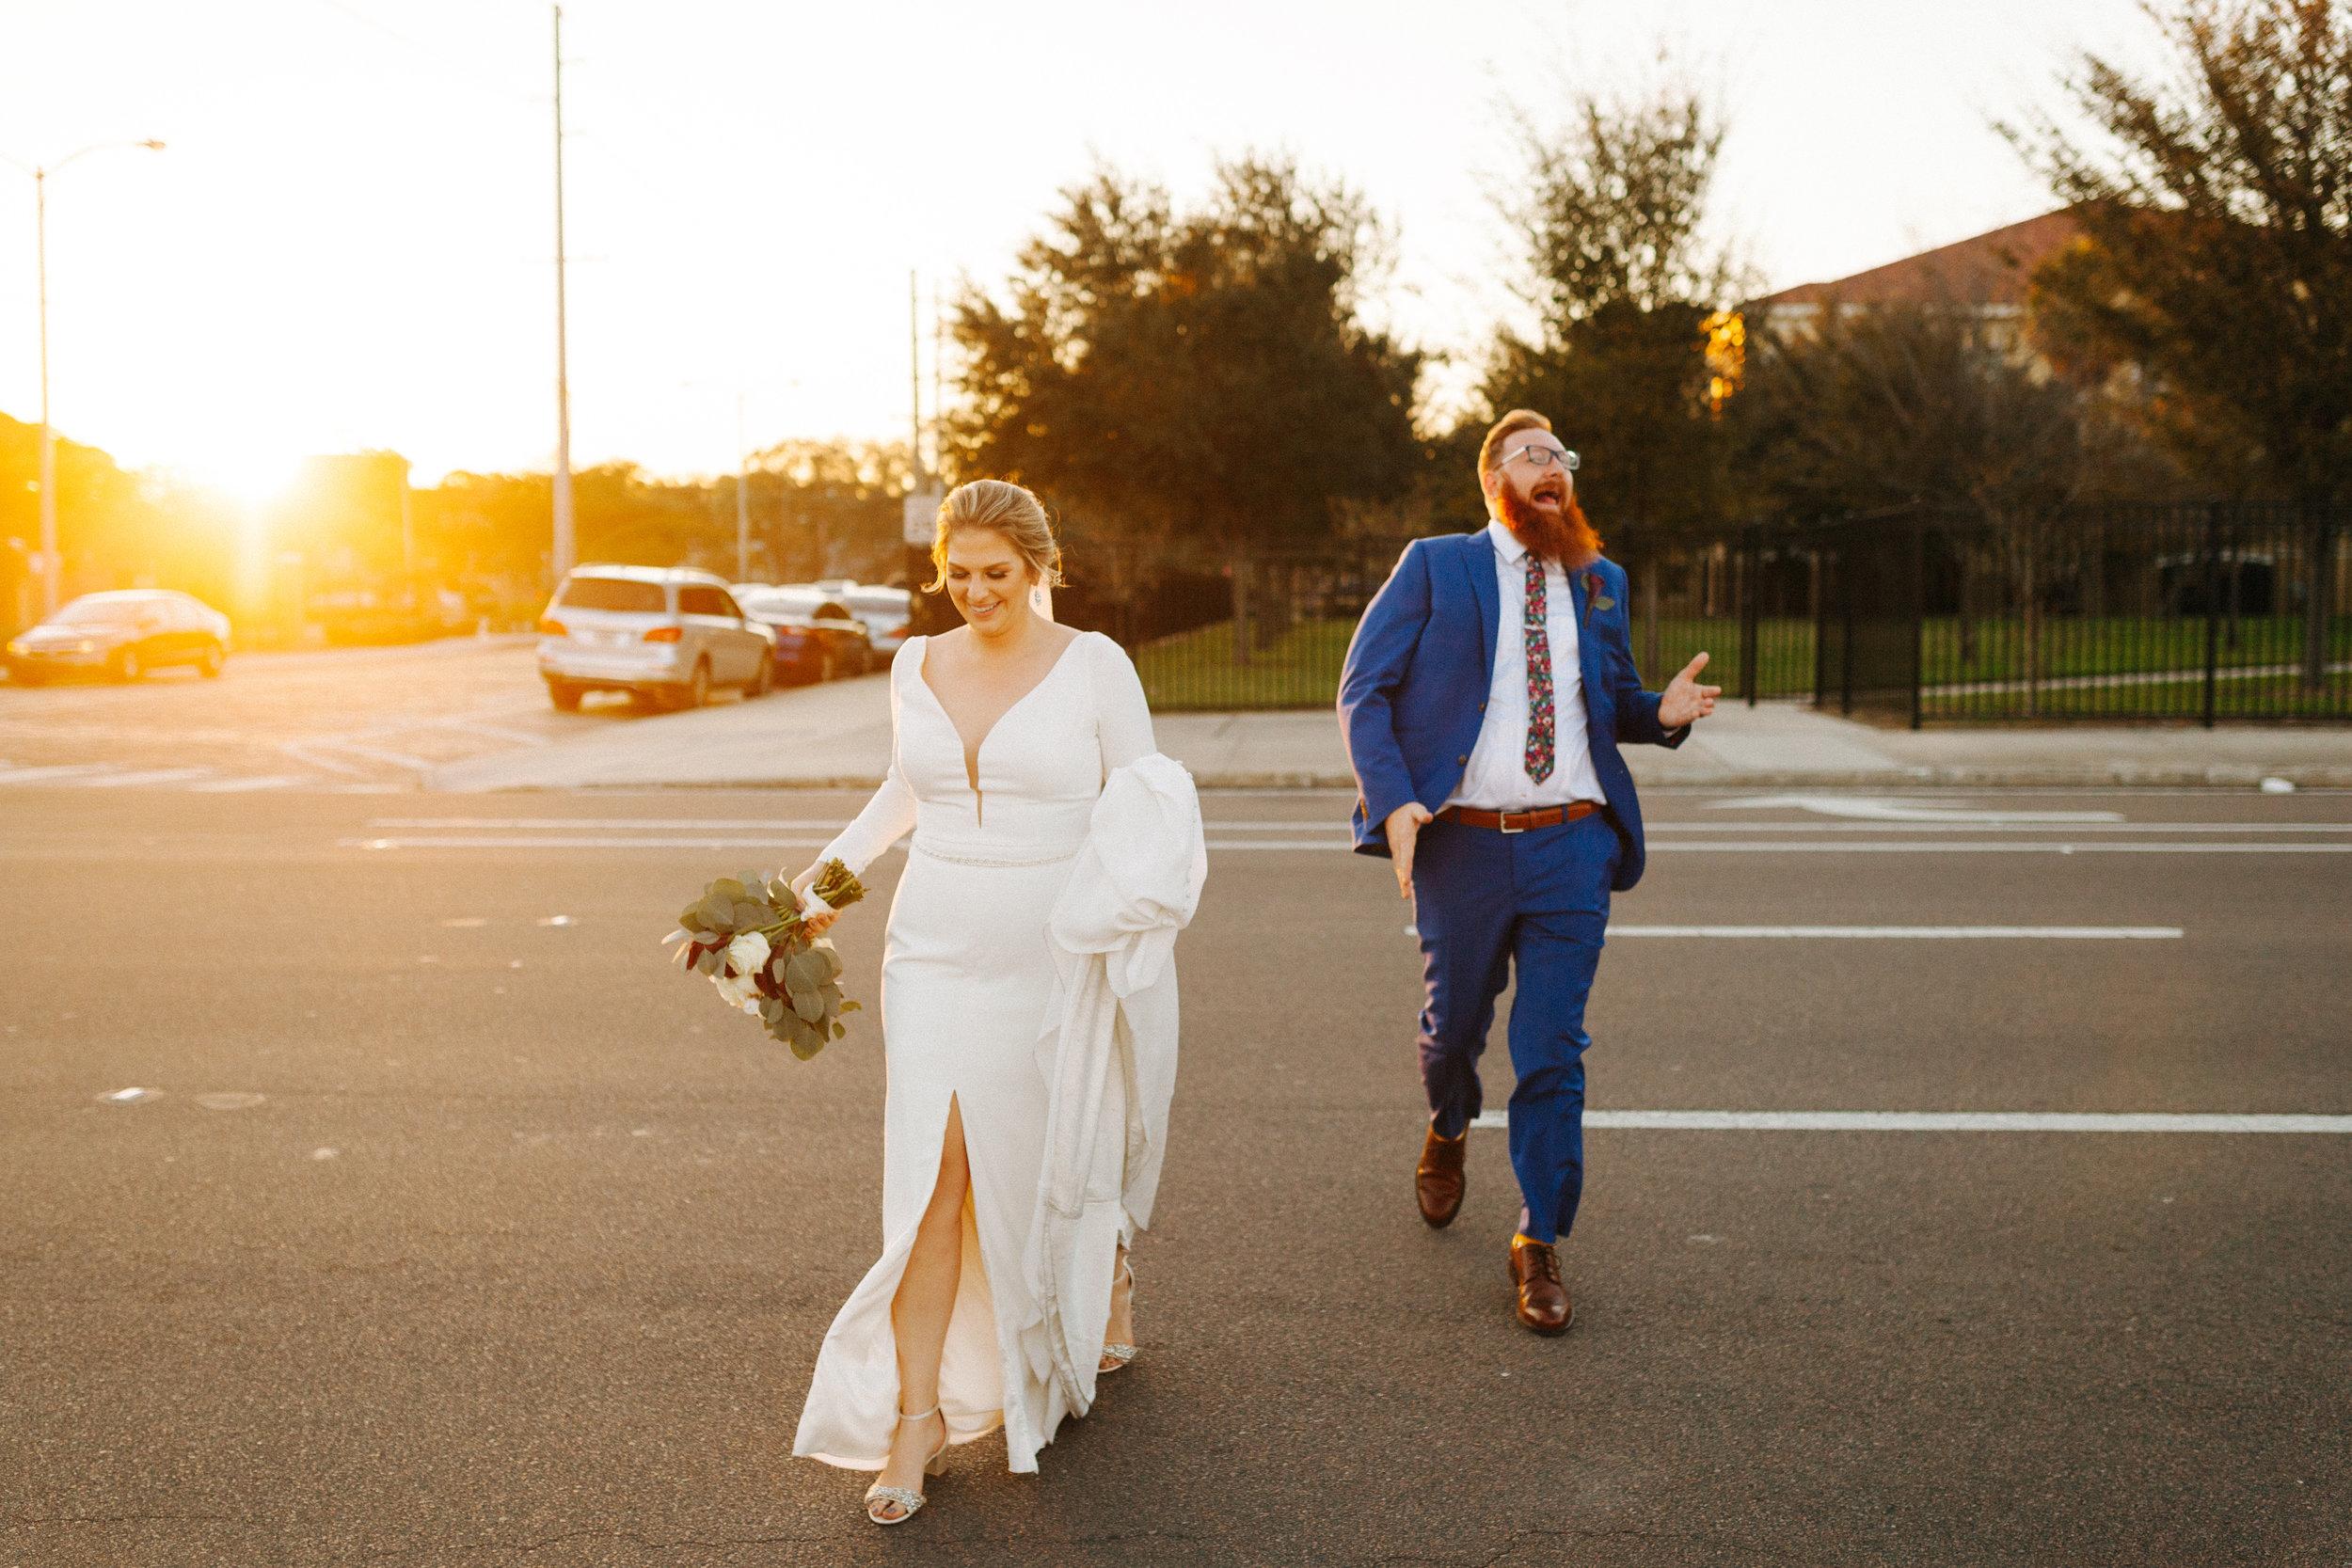 Mike & Heather - Portraits - Jake & Katie Photography_253.jpg